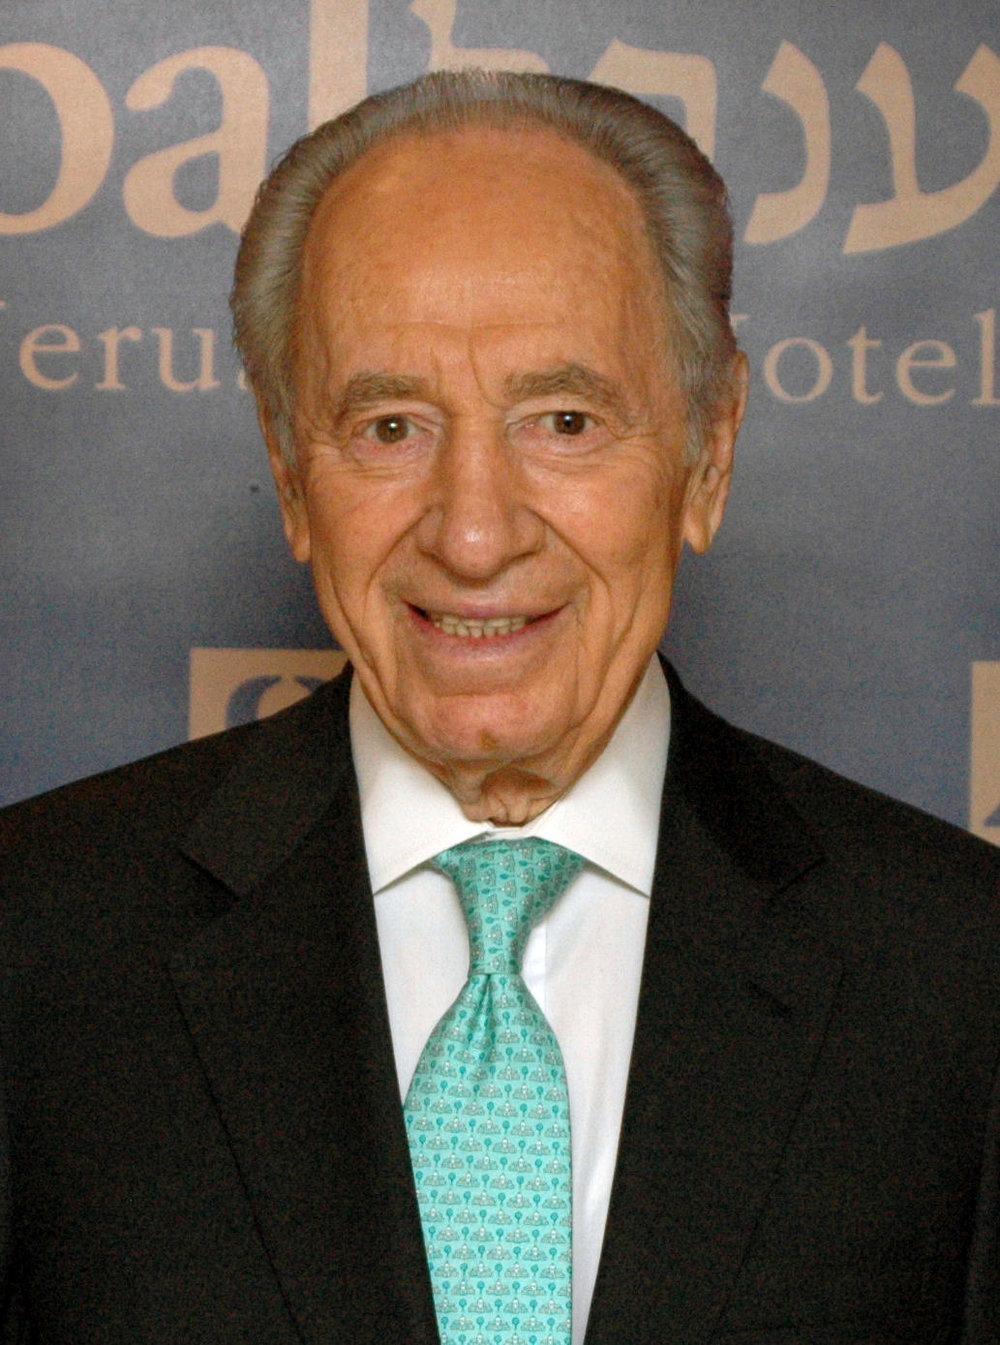 Shimon Peres. Credit: Wikimedia Commons.